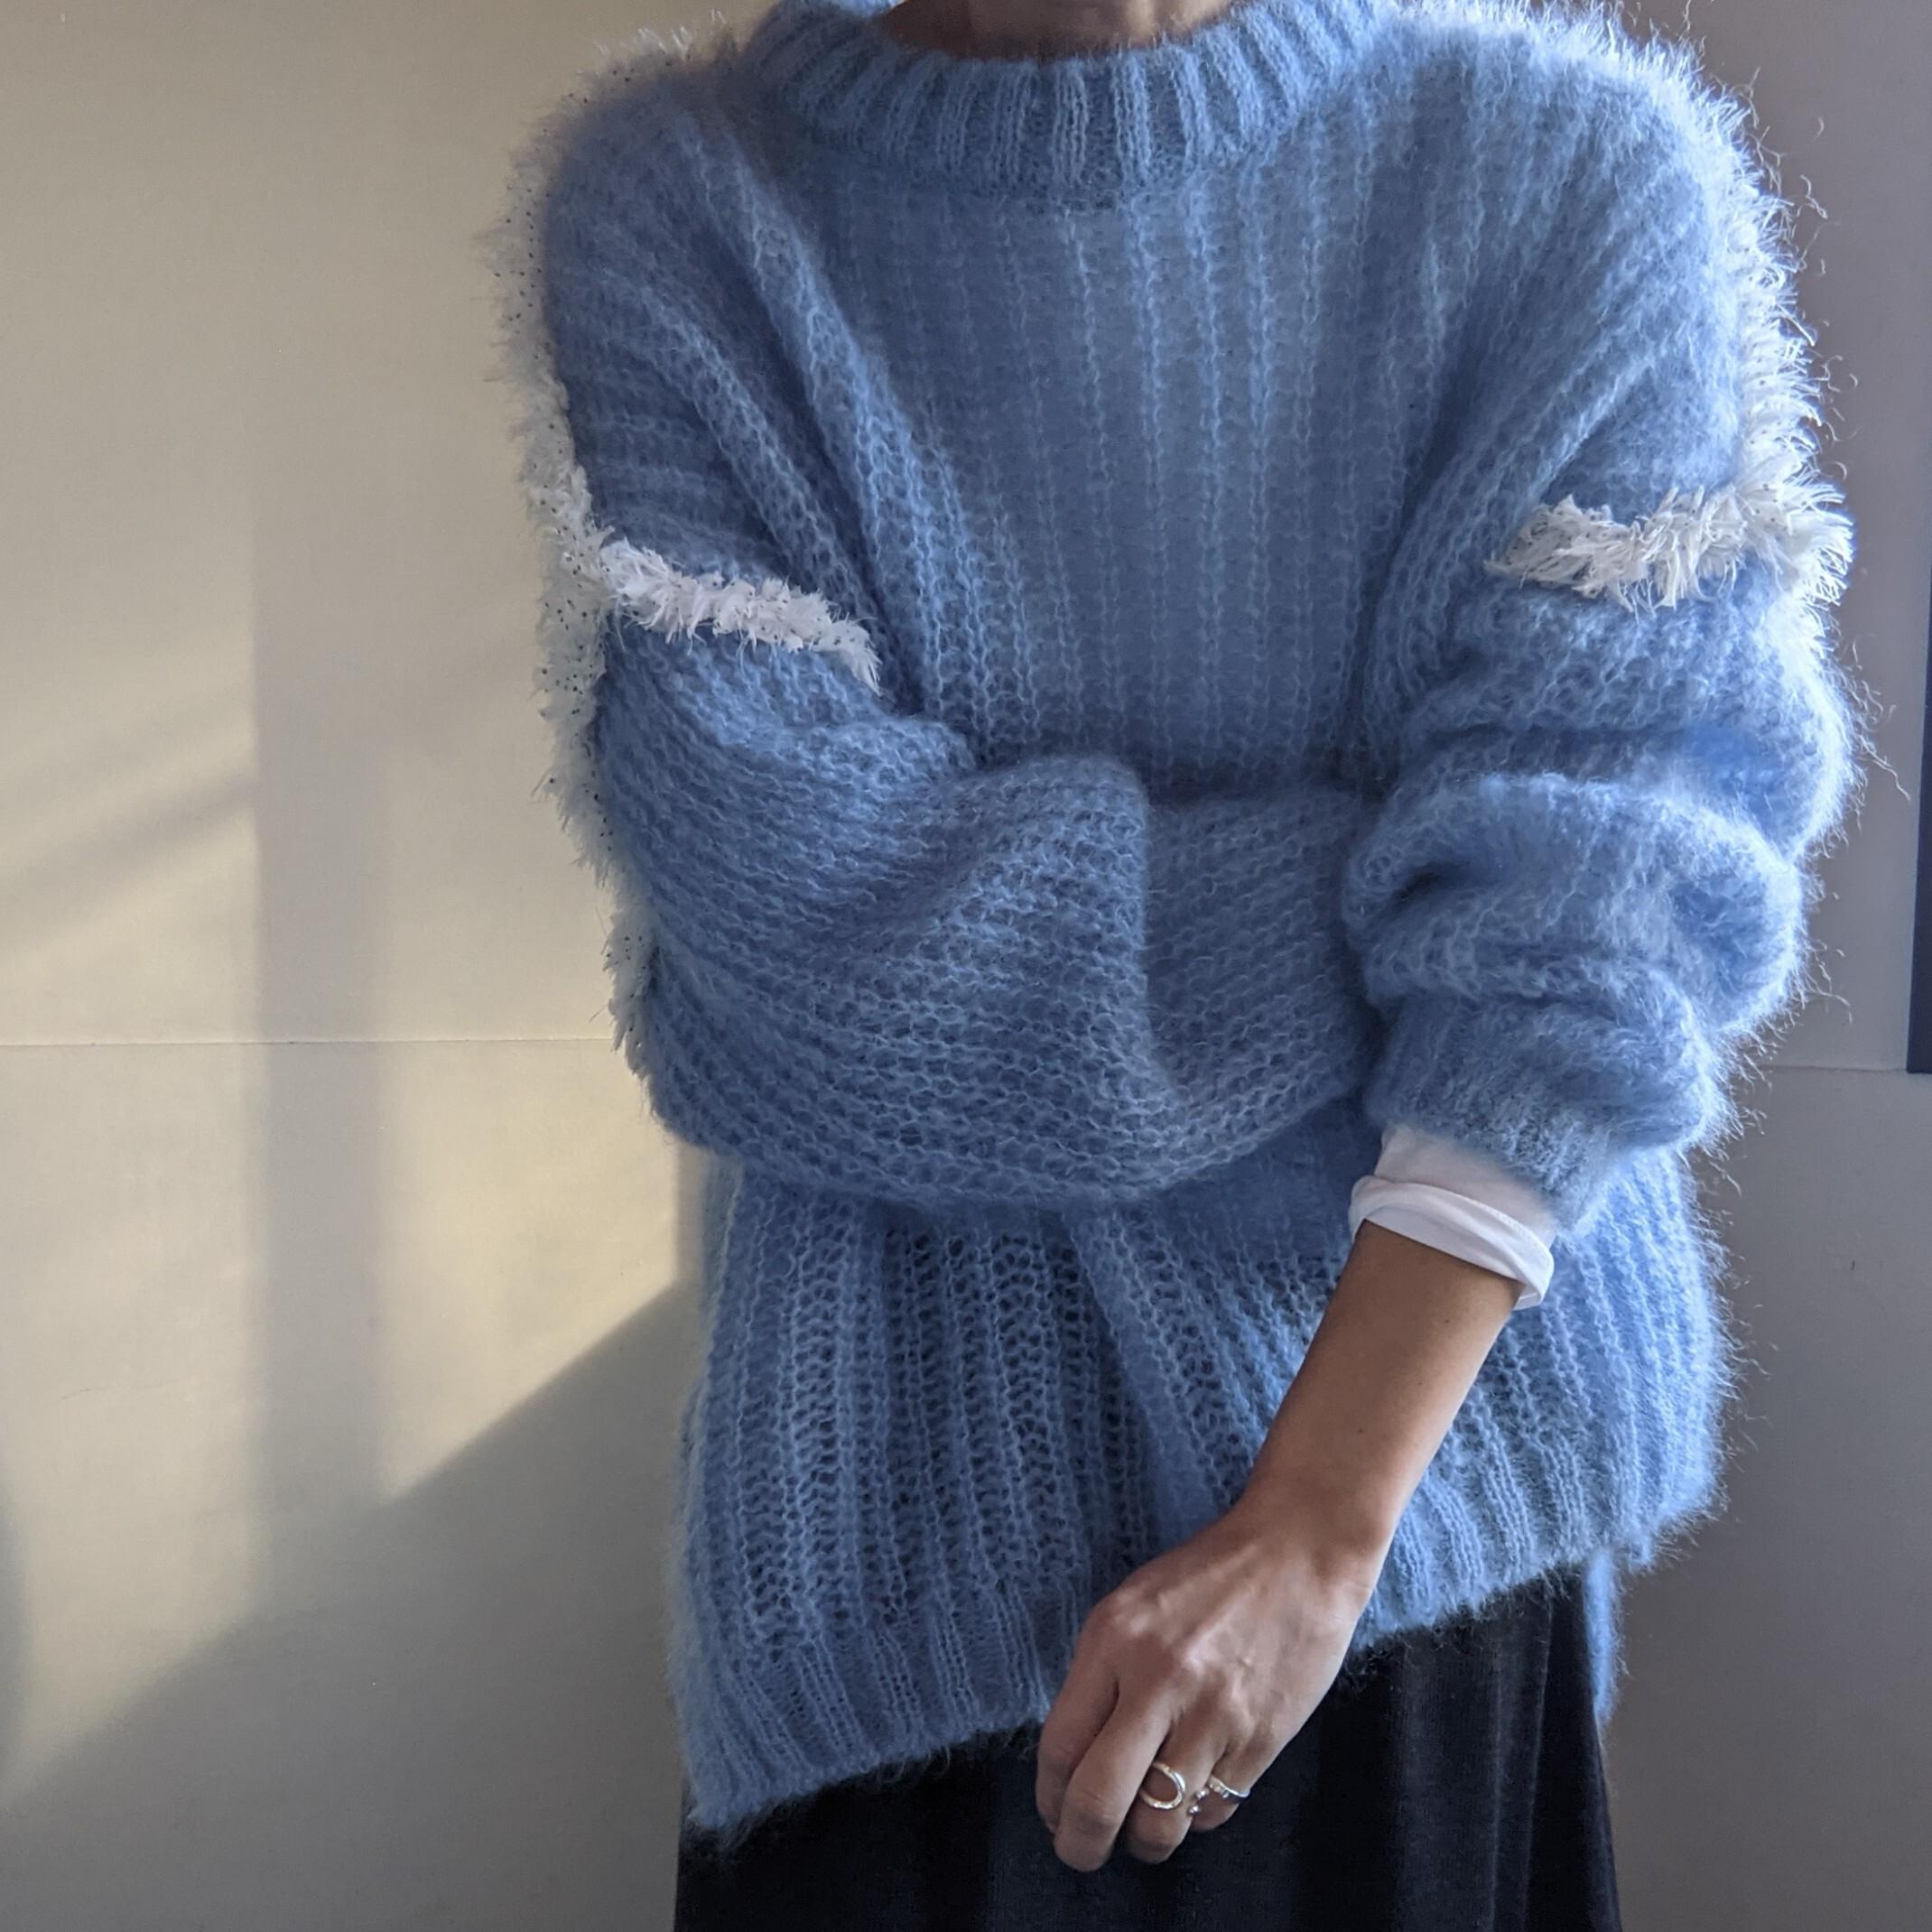 【 L'ANIT 】ラニット / frill mohair knit / light blue /水色